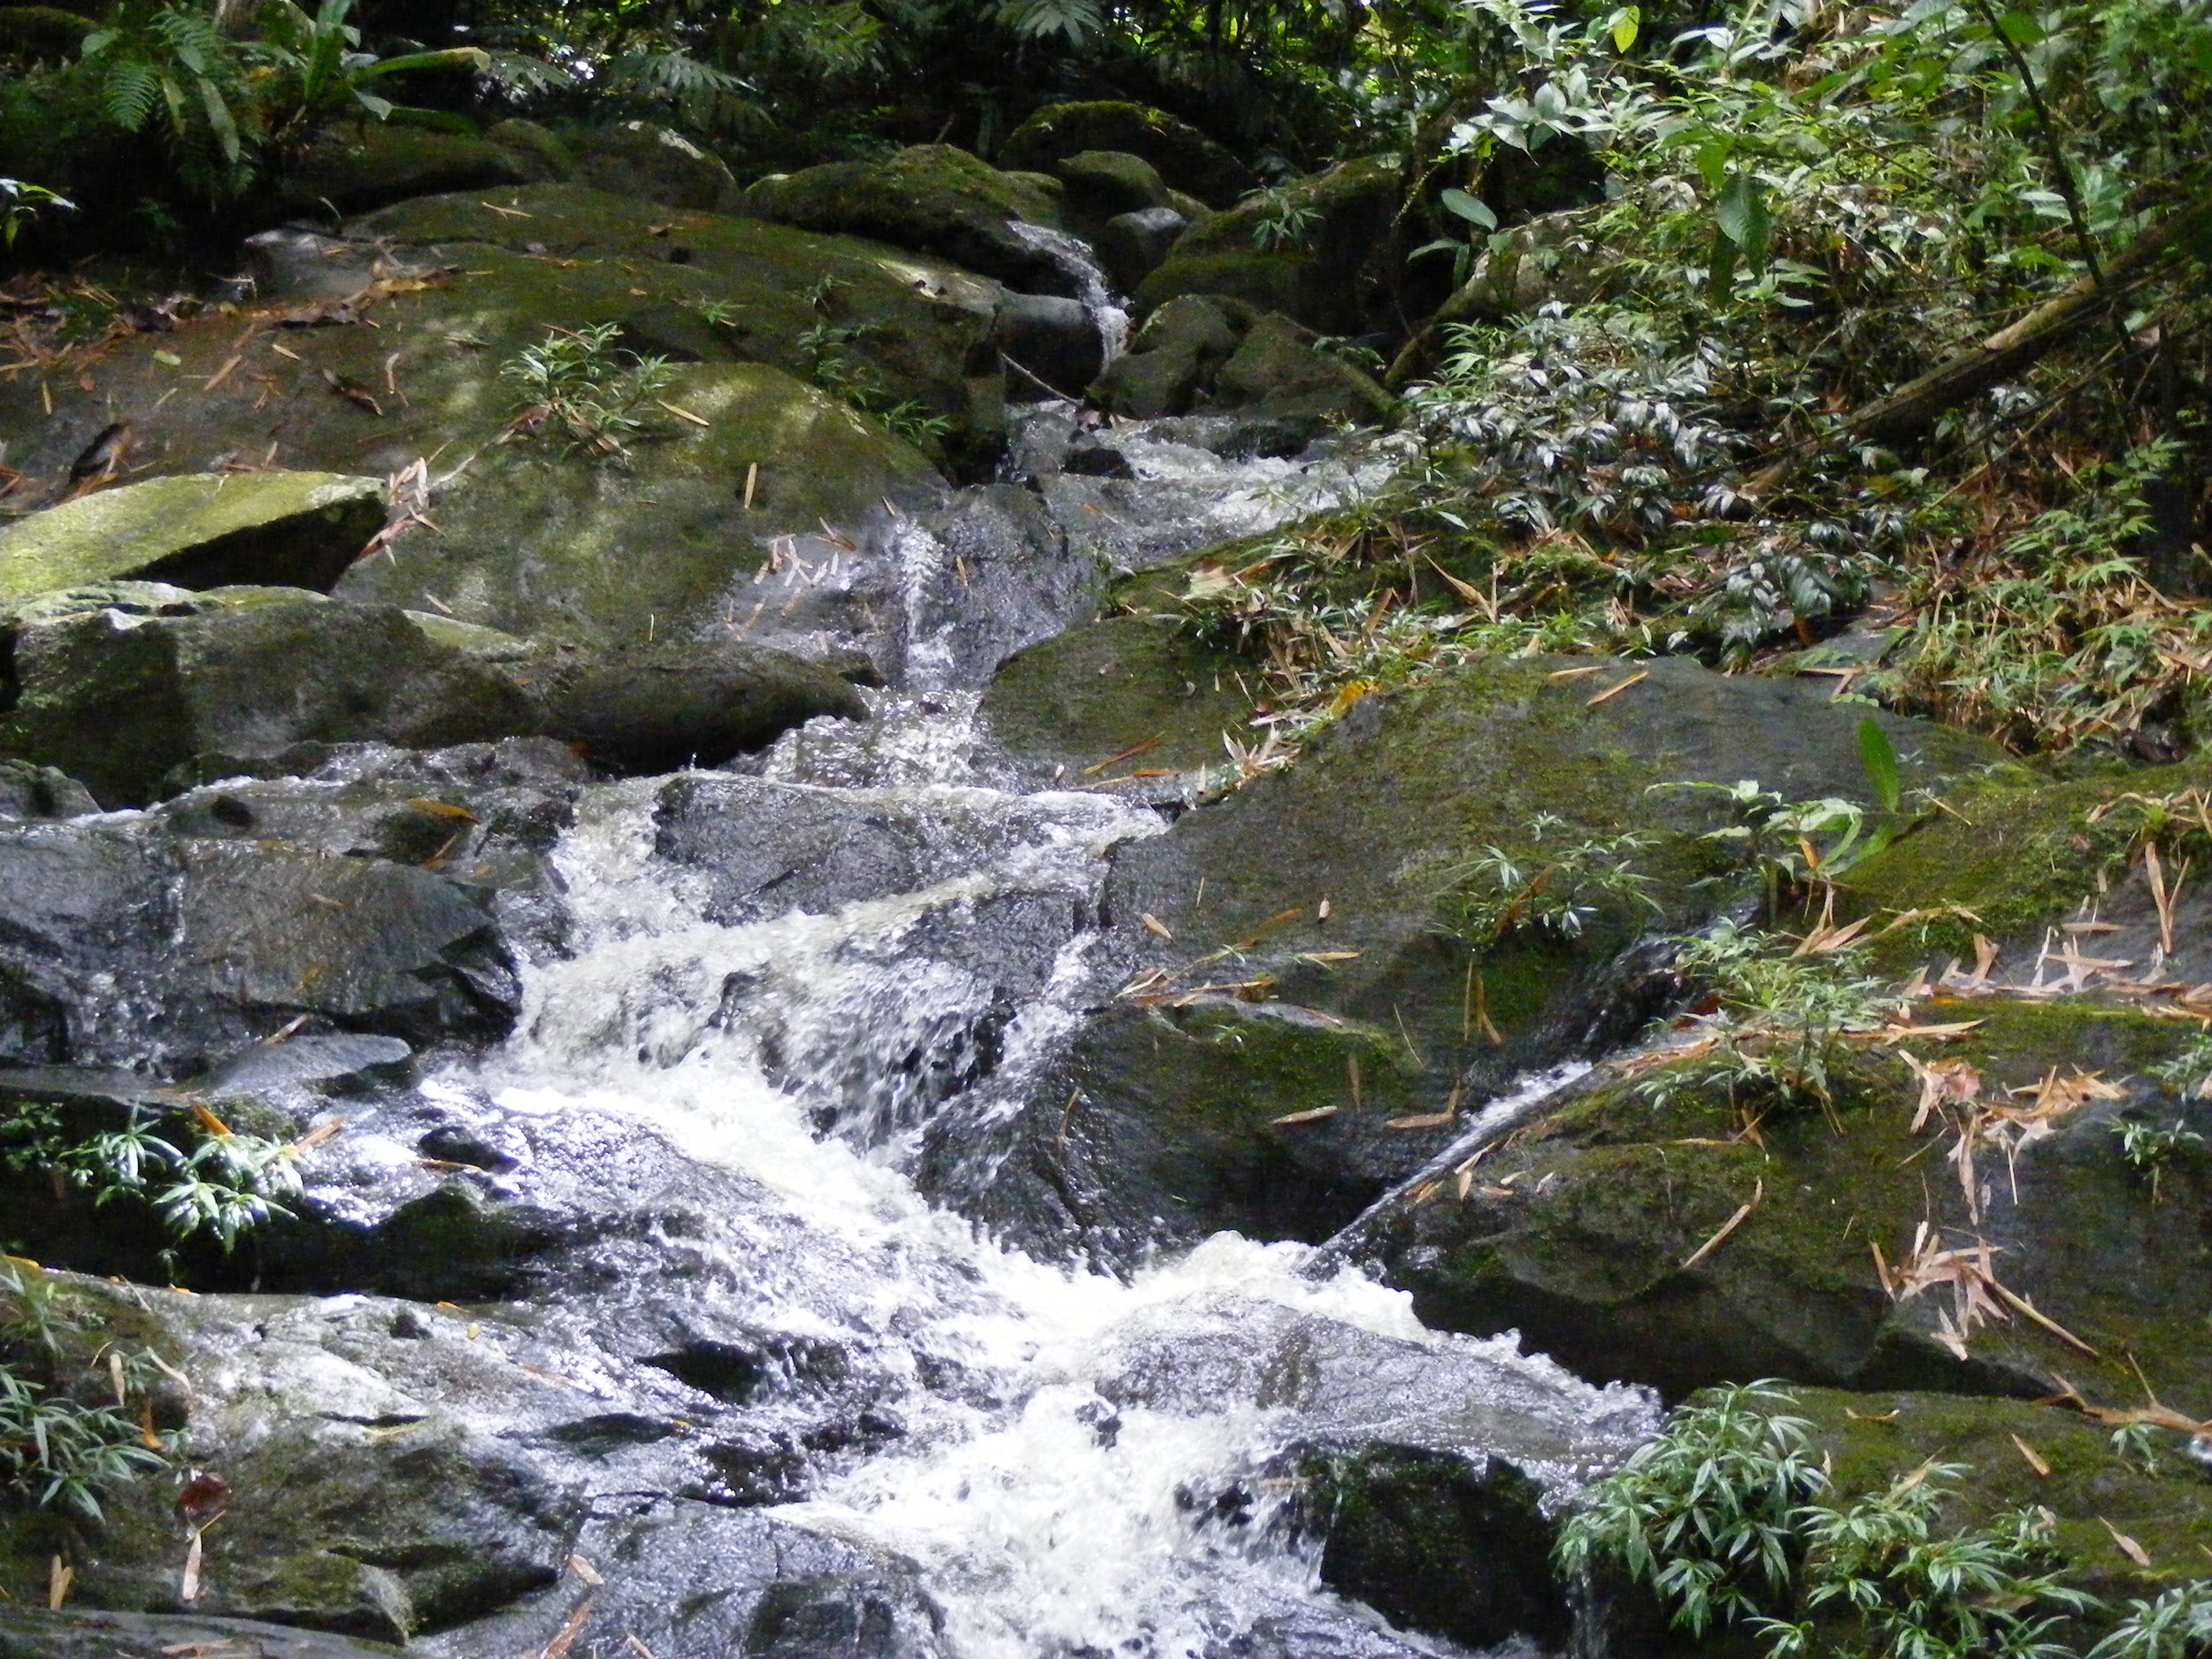 puerto-rico-mountain-rain-forest-wild-stream-water-1418009-pxhere.com.jpg